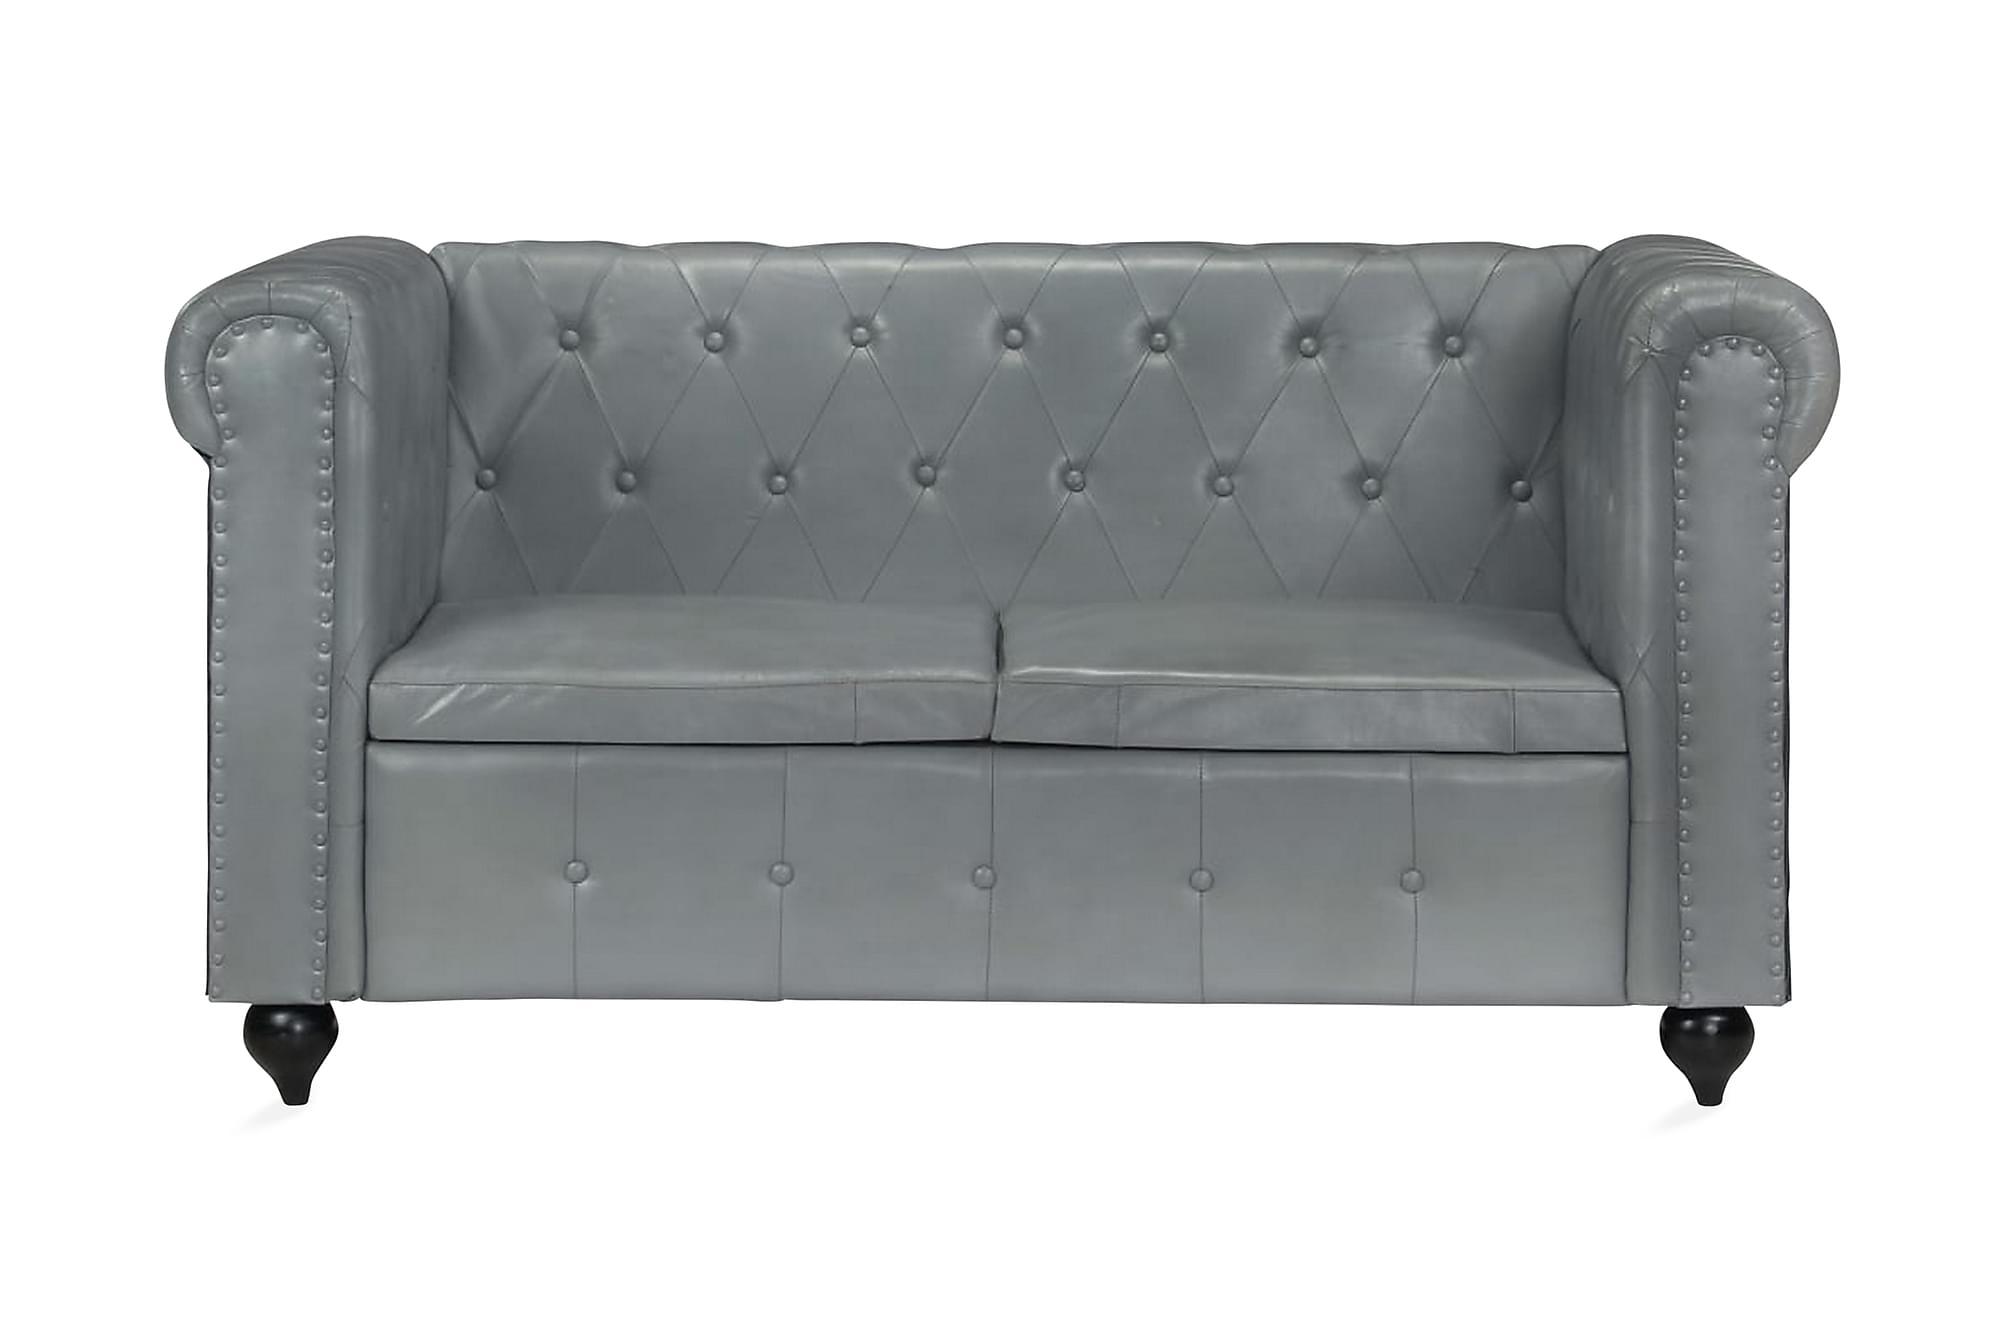 Chesterfieldsoffa 2-sits grå äkta läder